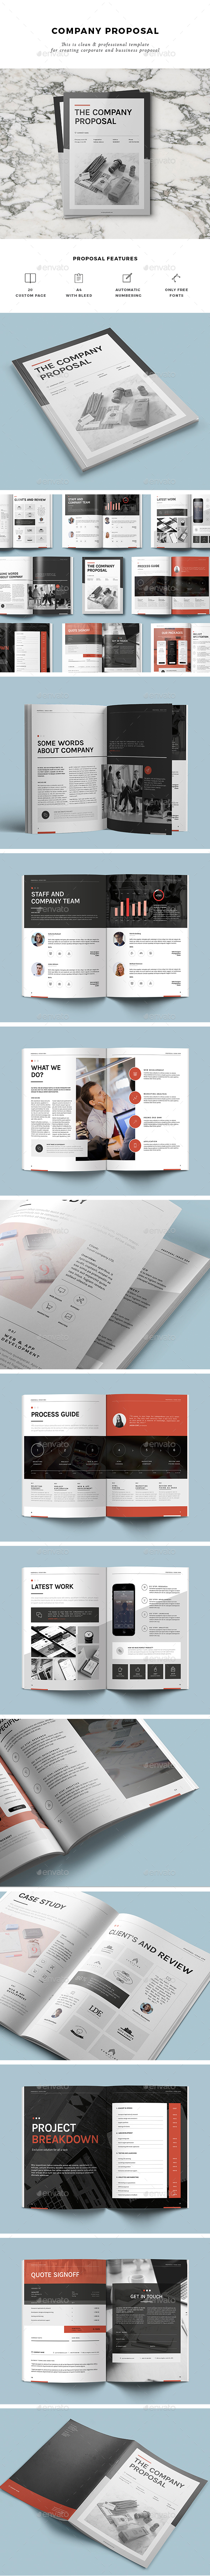 Presentation templates Proposal Brochure template Proposals